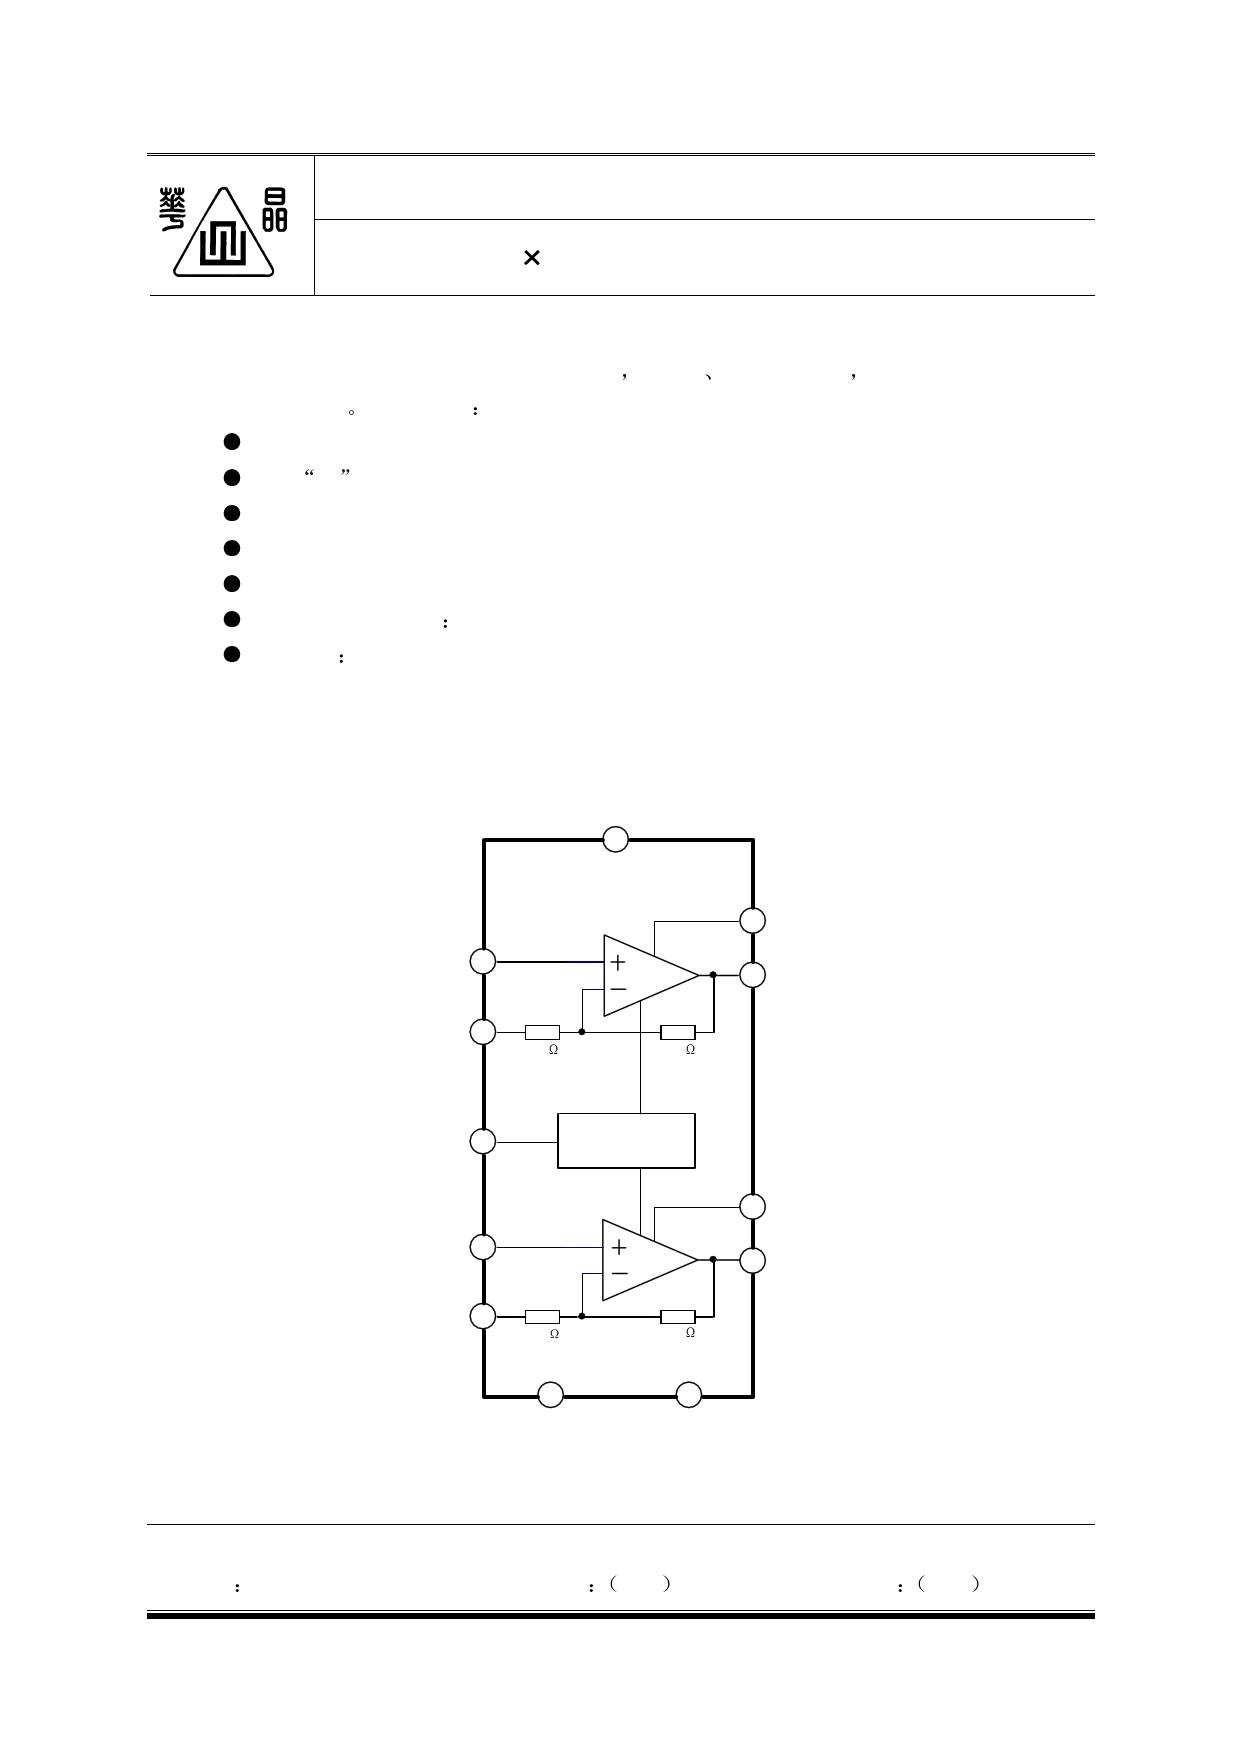 CD6283CS datasheet, circuit